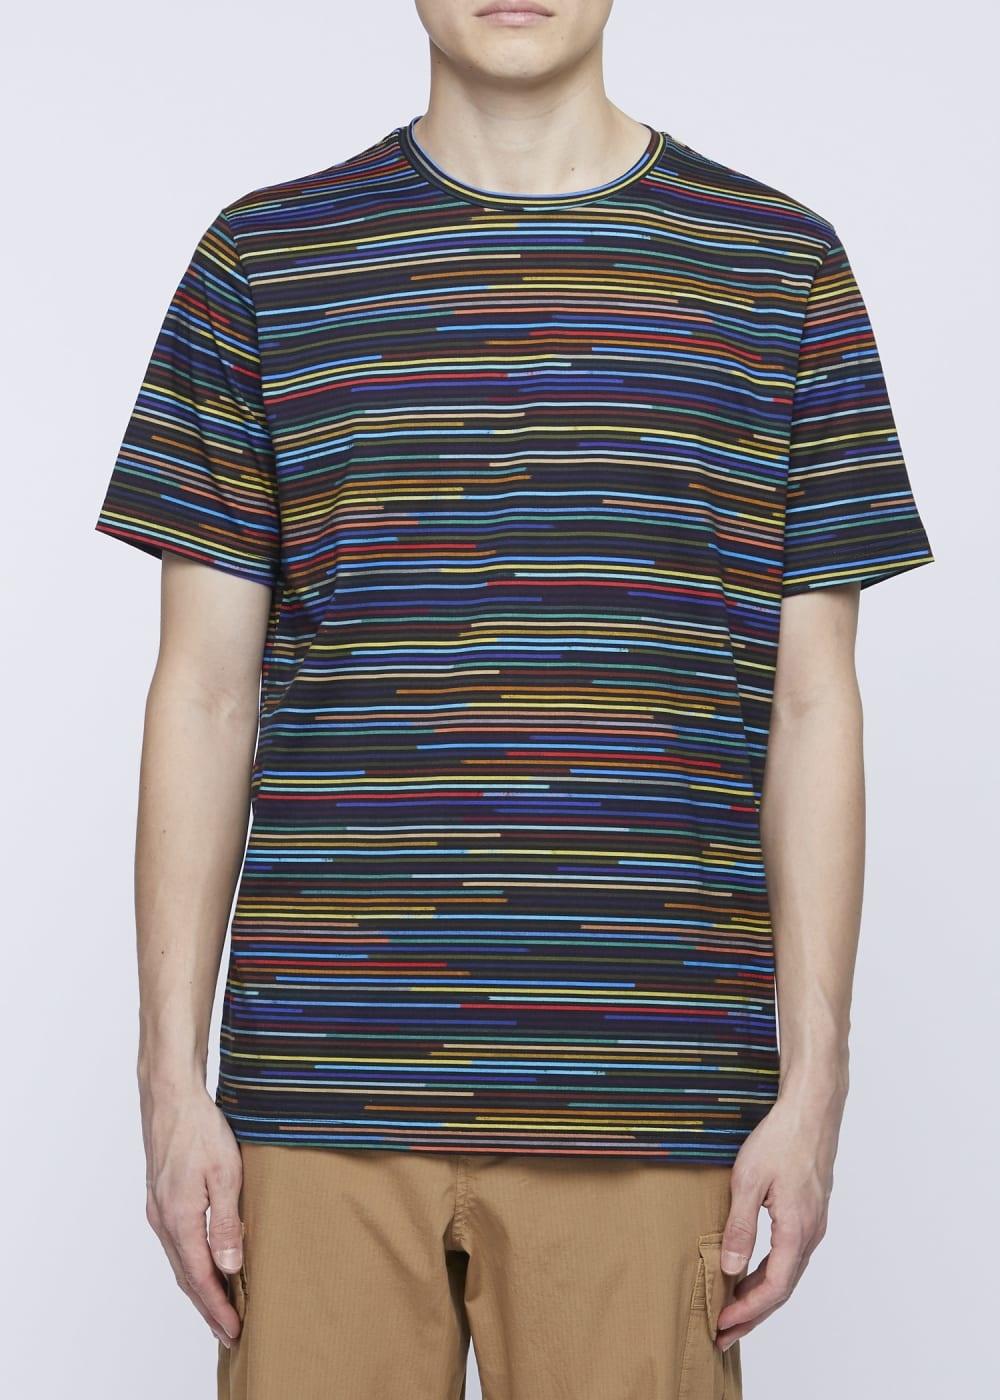 Paul Smith T-shirt Paul Smith M2R-238U-F21165-79